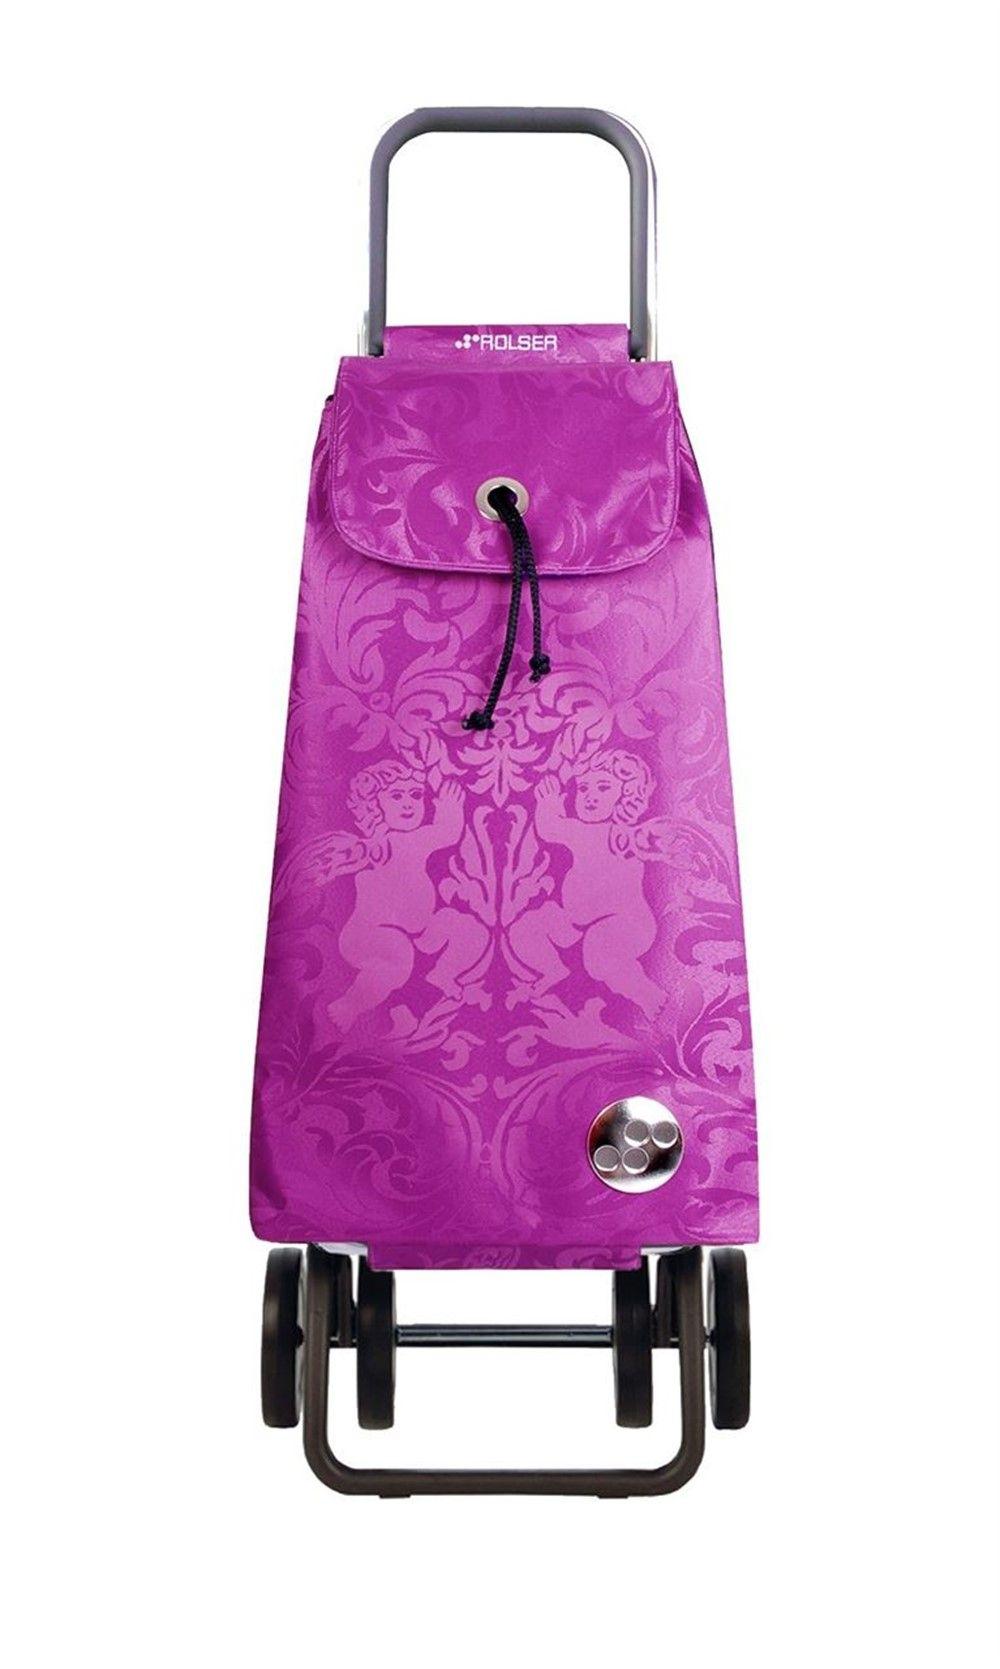 cb5798fbbb56 Carro Rolser Pack Gloria Logic dos+2 mal | Paris | Shopping ...